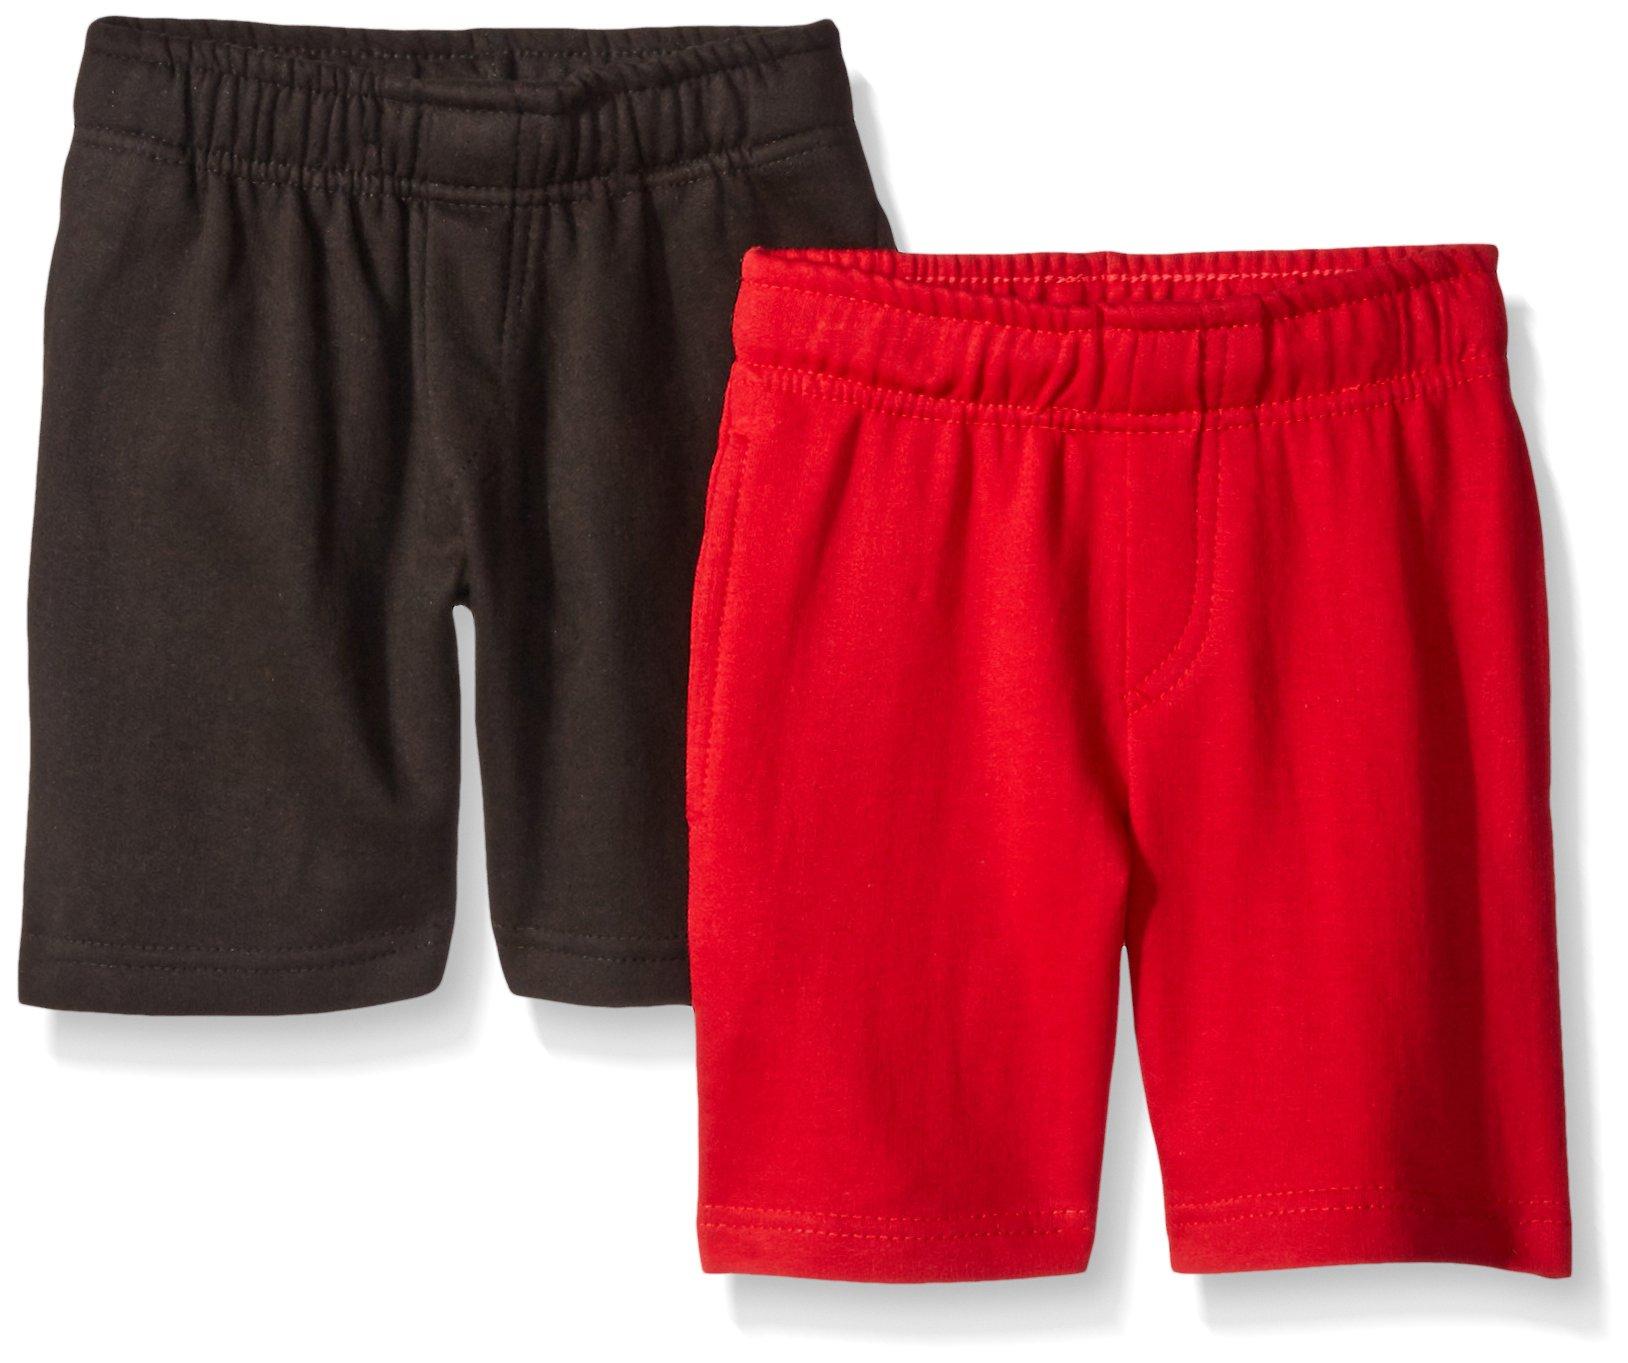 American Hawk Little Boys' Toddler 2 Piece Pack Fleece Shorts, Black/Red, 4T/4